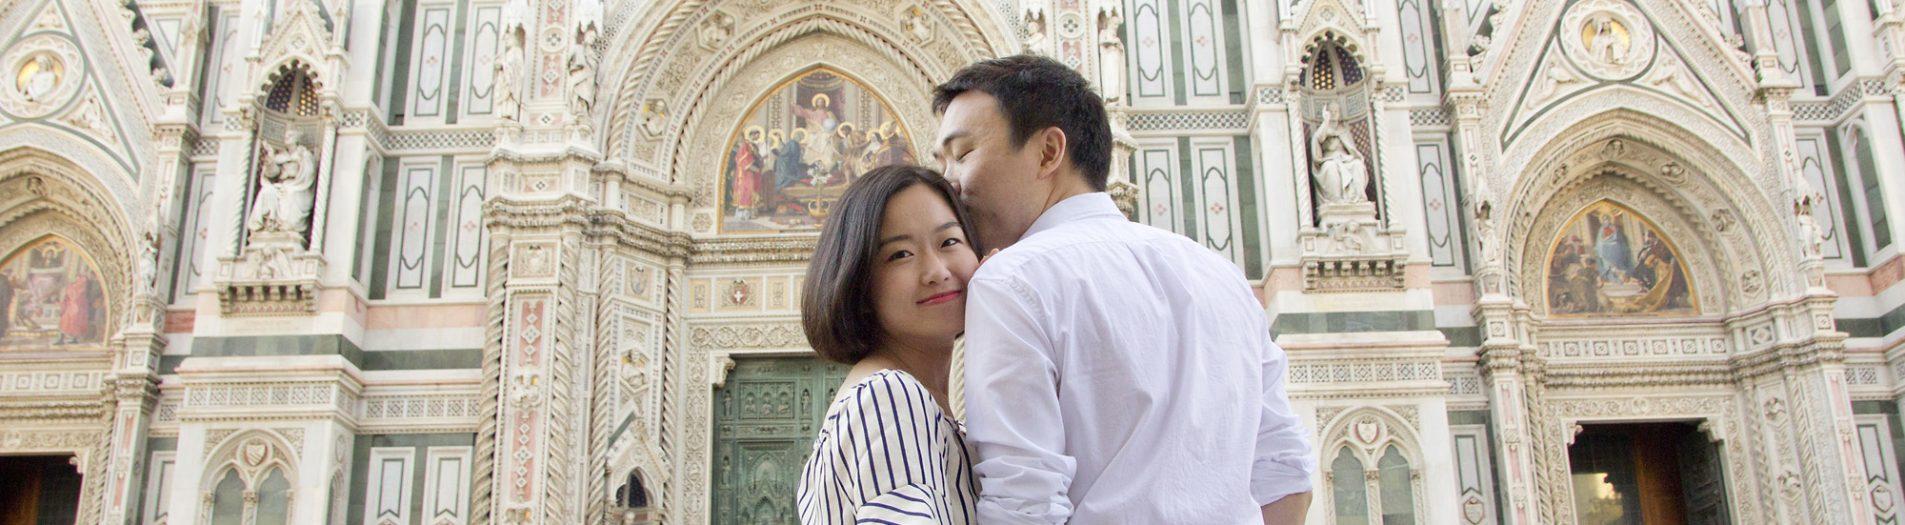 Florence, Italy Honeymoon Photoshoot